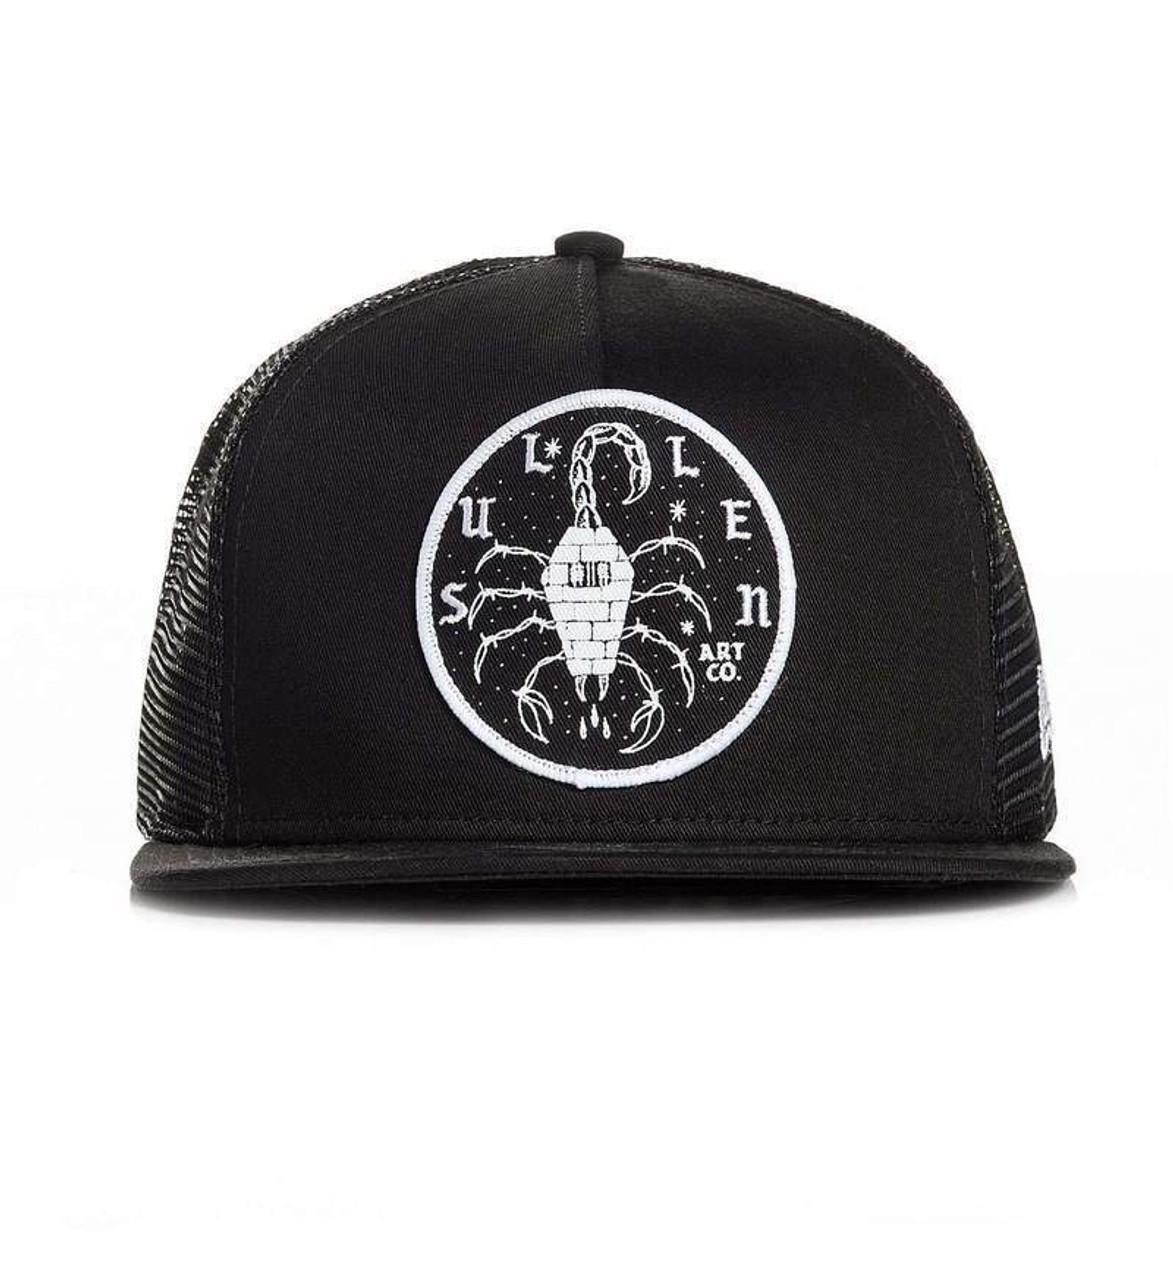 Sullen Clothing Killing Time Scorpion Art Snapback Trucker Mesh Cap Hat  SCA2204 - Fearless Apparel 220e0c555d42